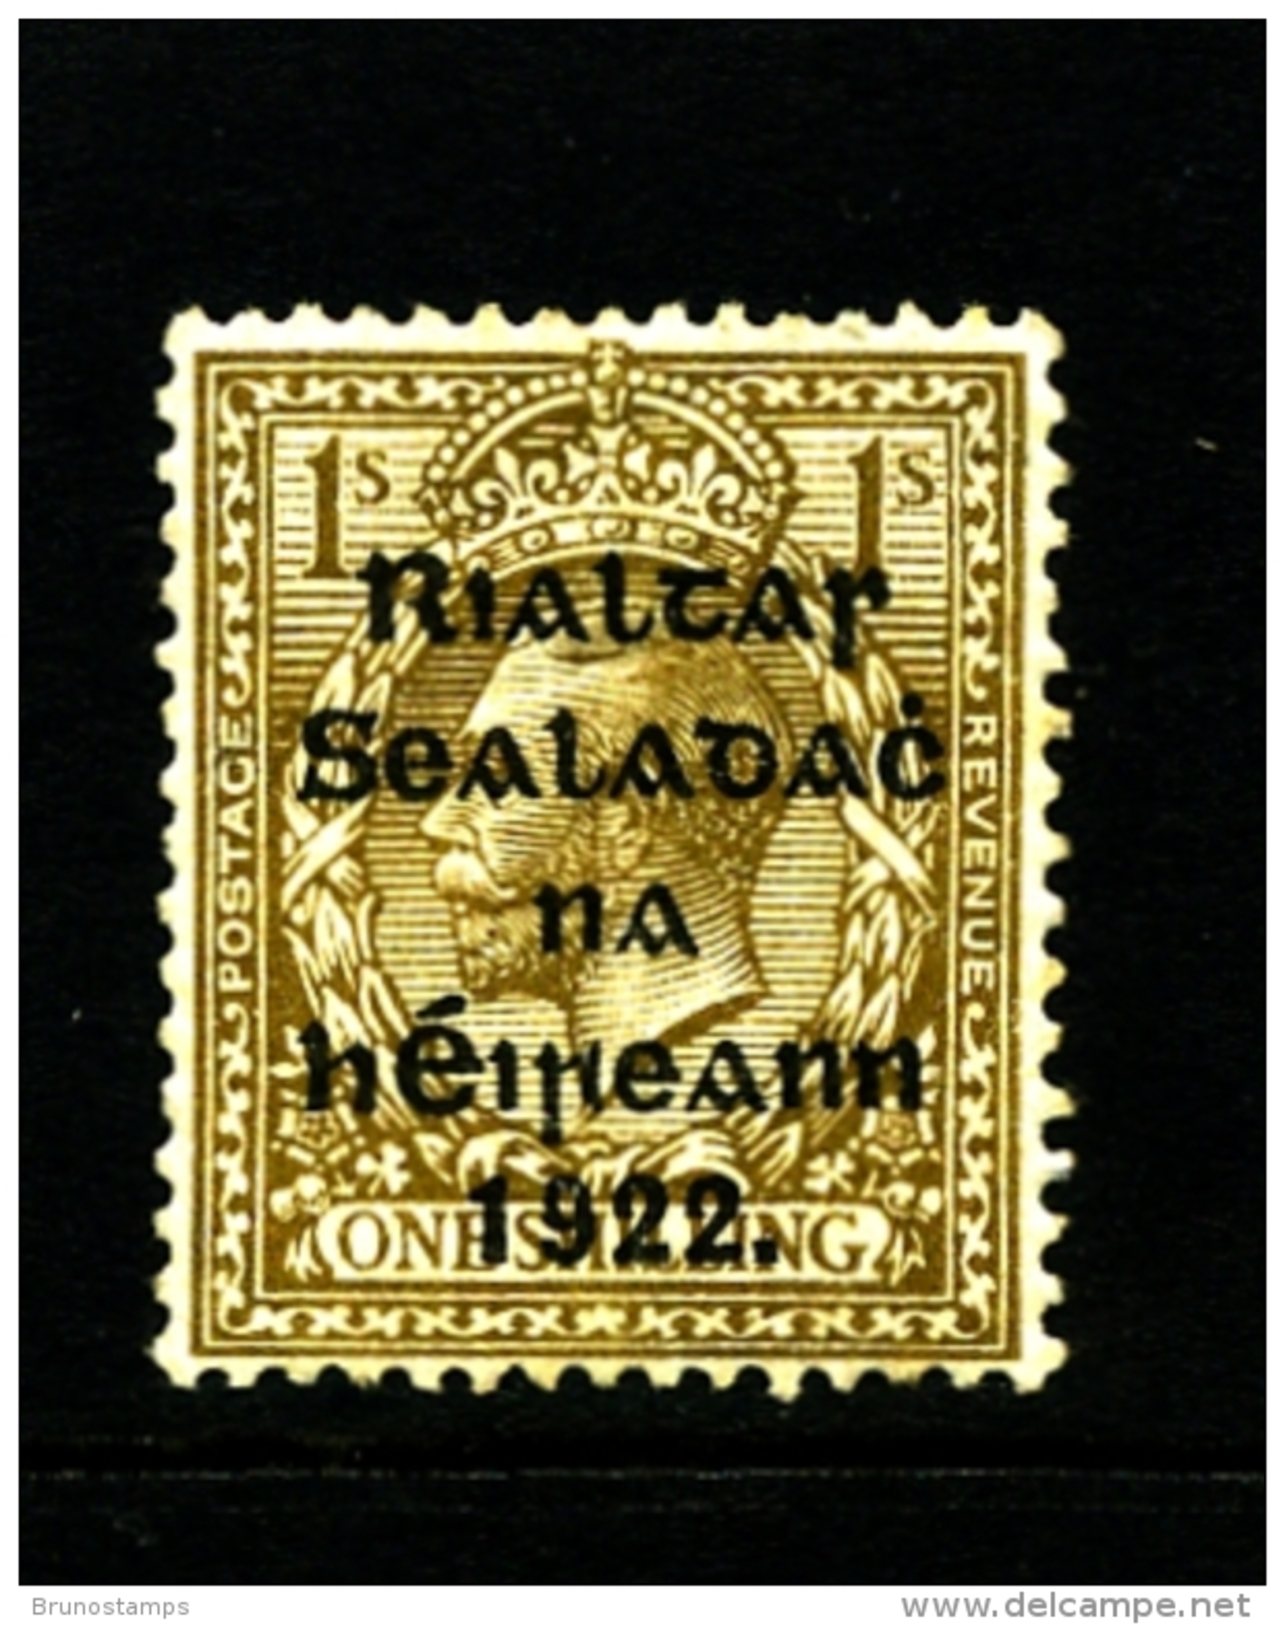 IRELAND/EIRE - 1922 1s. OVERPRINTED THOM  MINT SG 15 - 1922 Governo Provvisorio